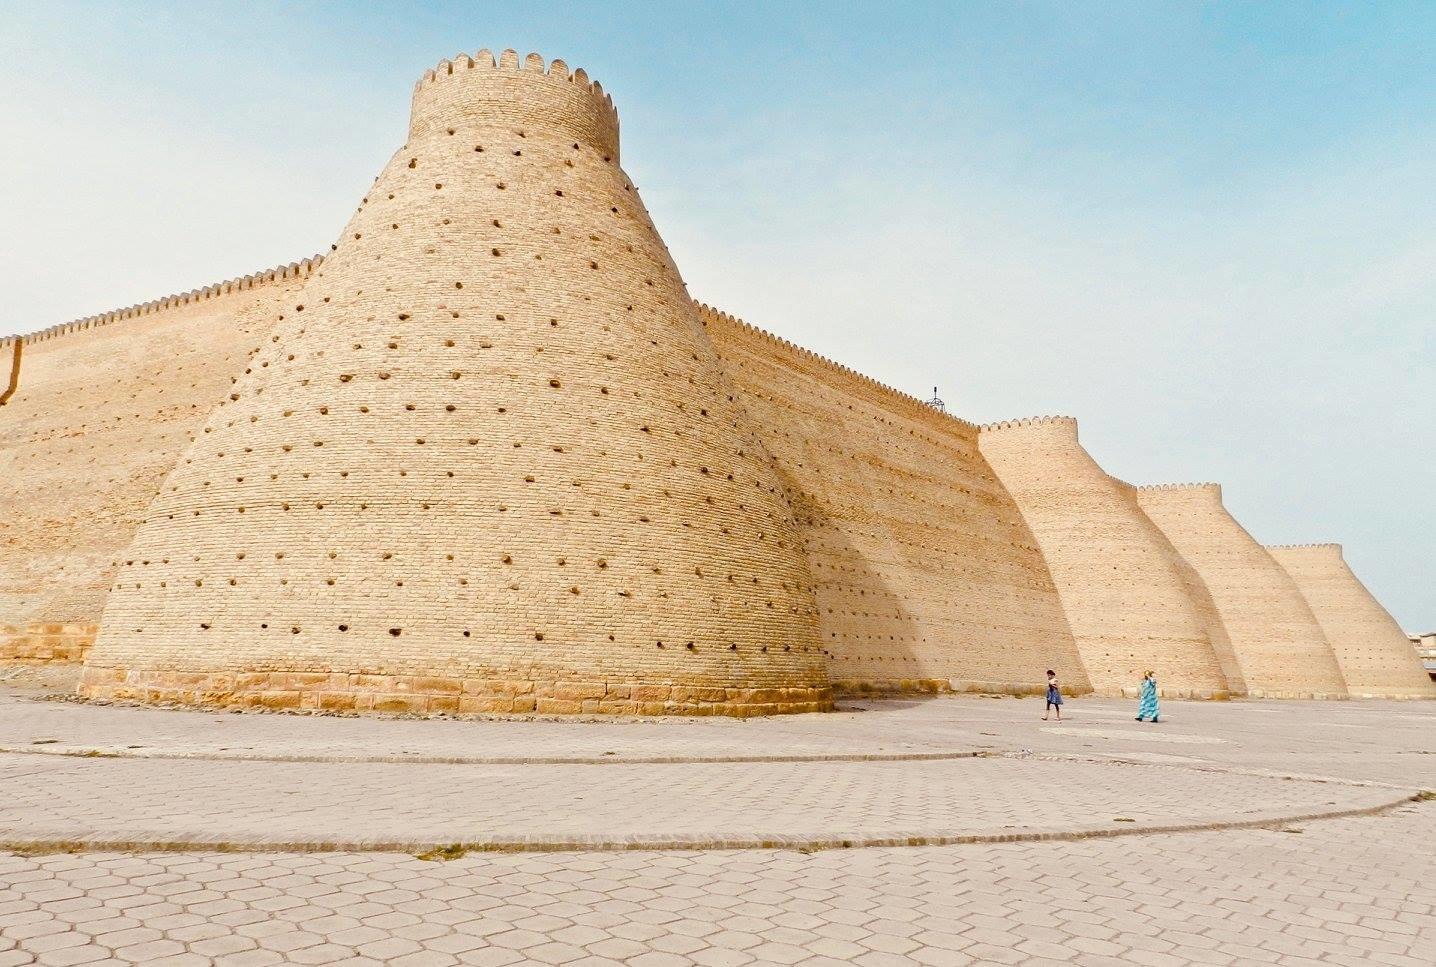 bukhara-uzbekistan-5764ff9d732a437330fa1